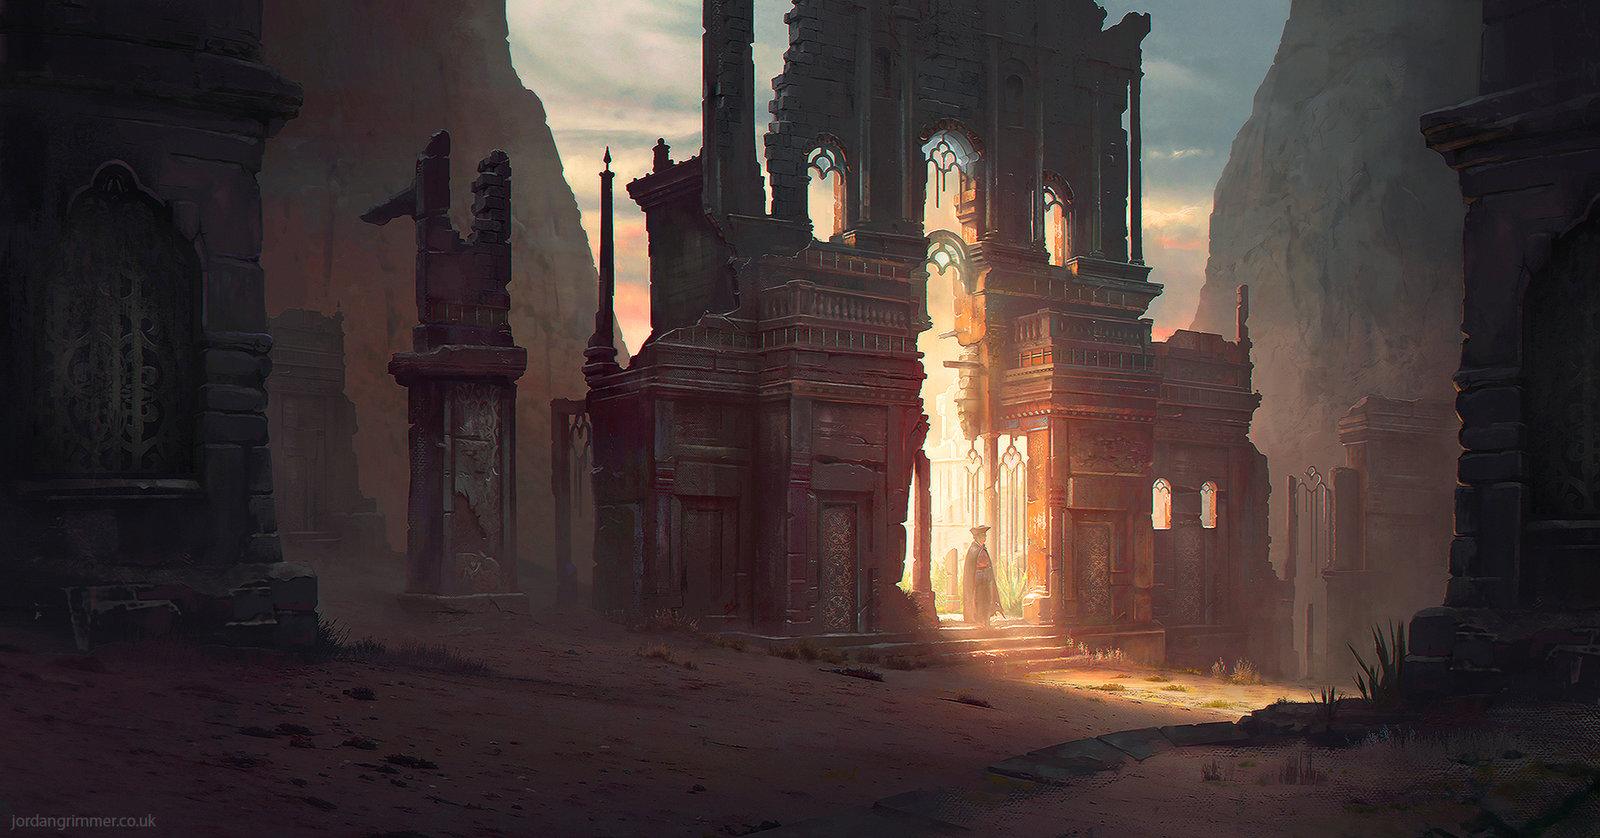 1442-the-broken-gate-jordan-grimmer